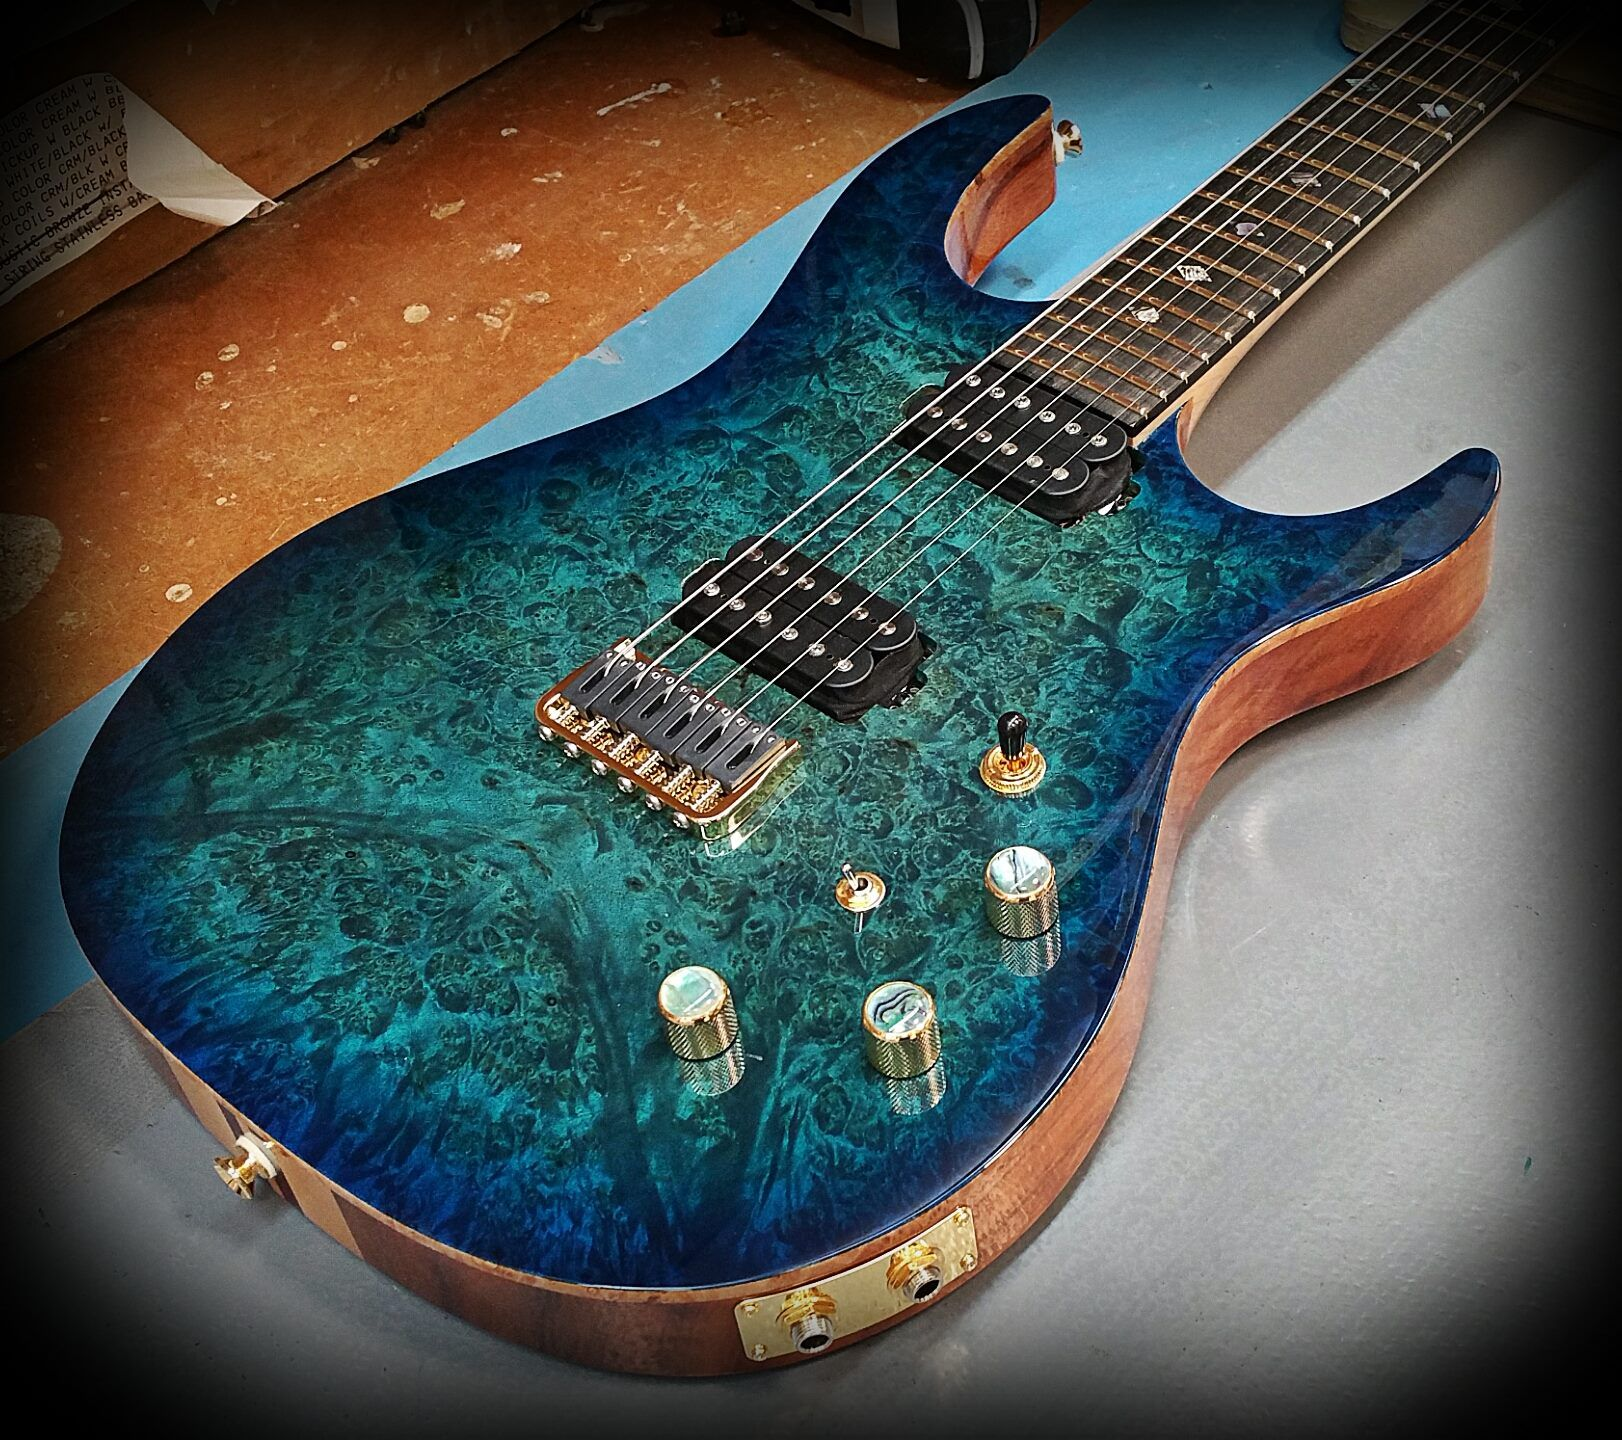 kiesel guitars carvin guitars lmp6translucent aquaburst over burl maple top on koa body [ 1622 x 1440 Pixel ]